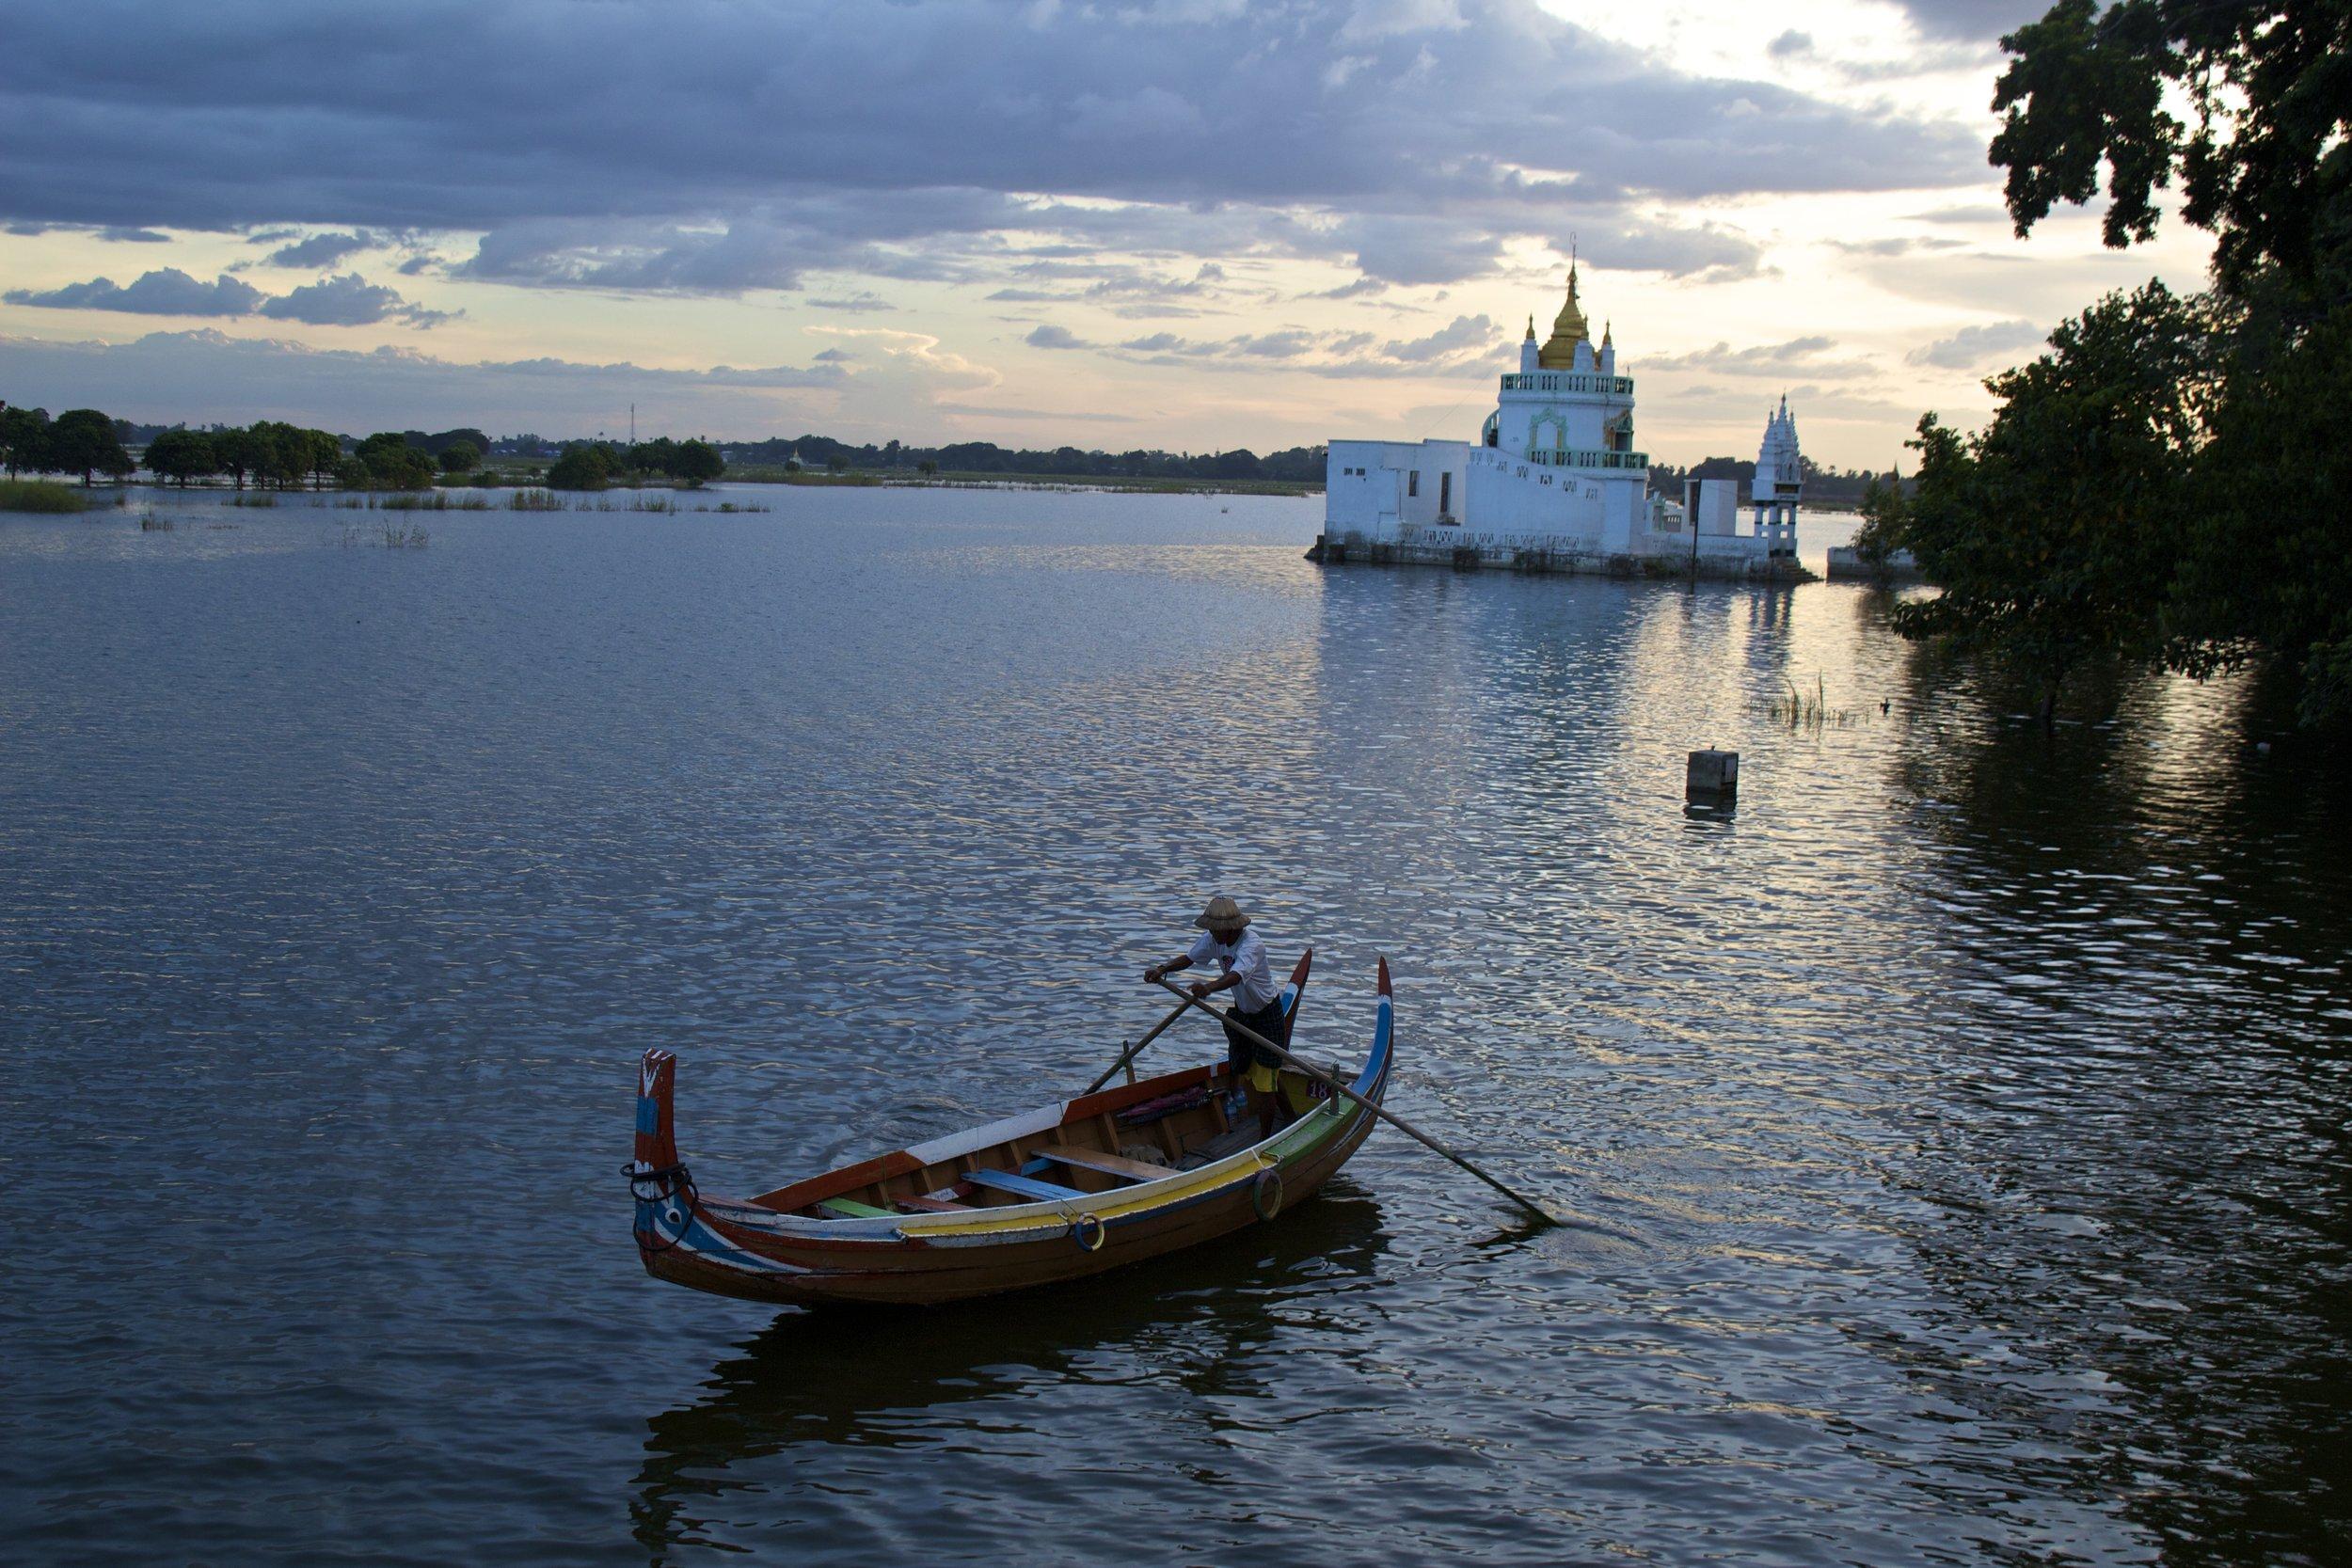 U Bein Bridge Mandalay Burma Myanmar 6.jpg